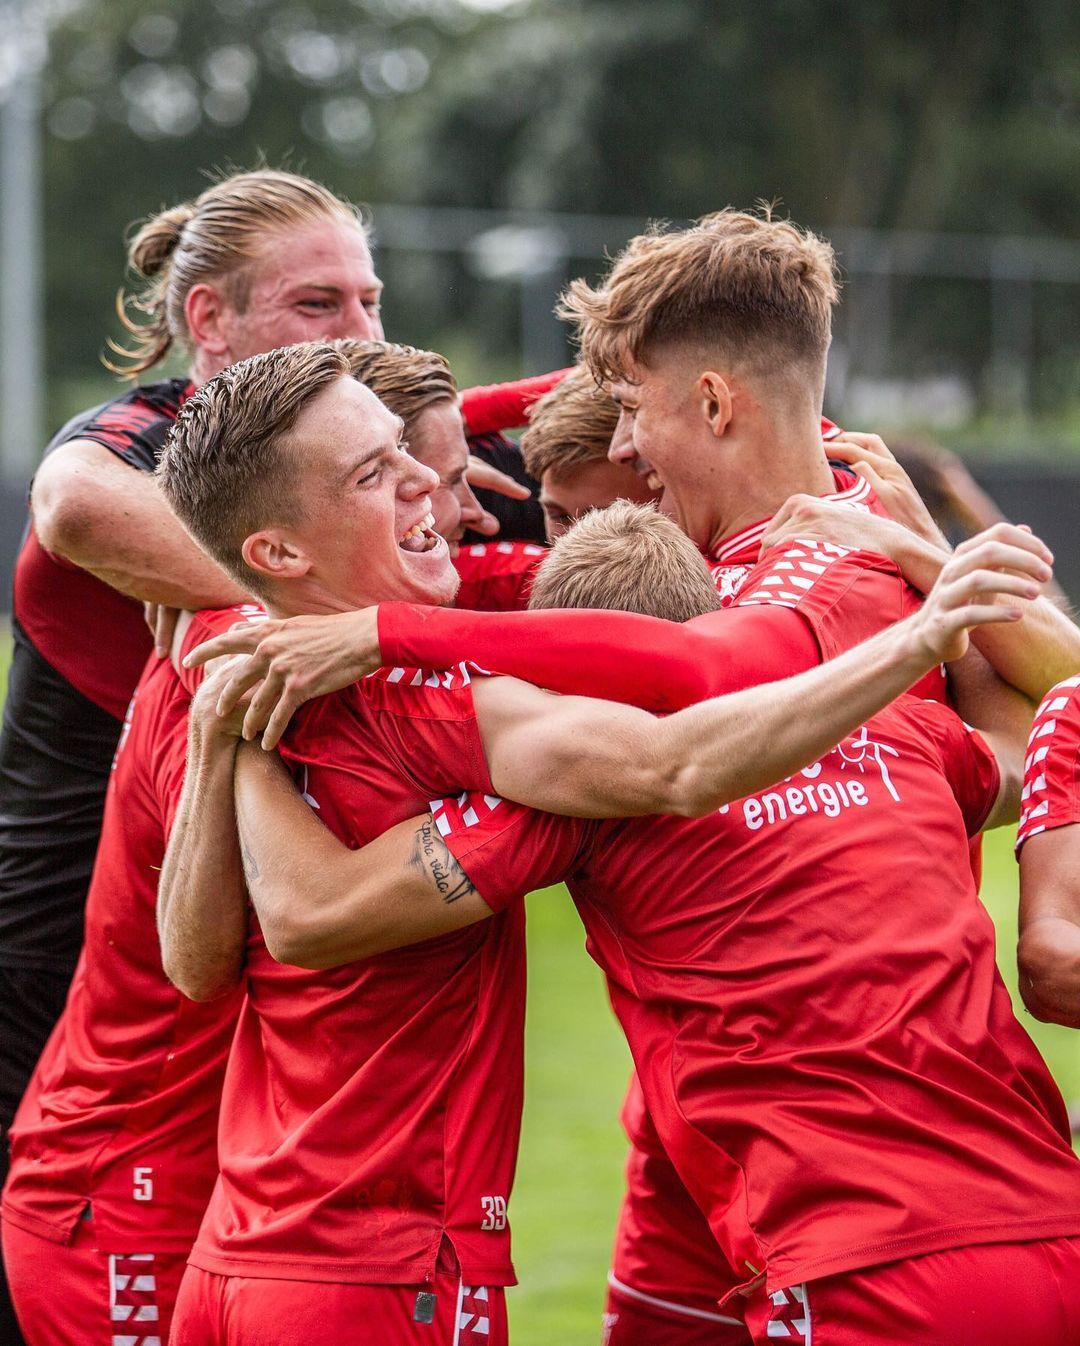 FC Twente Eredivisie Live Streams 2021